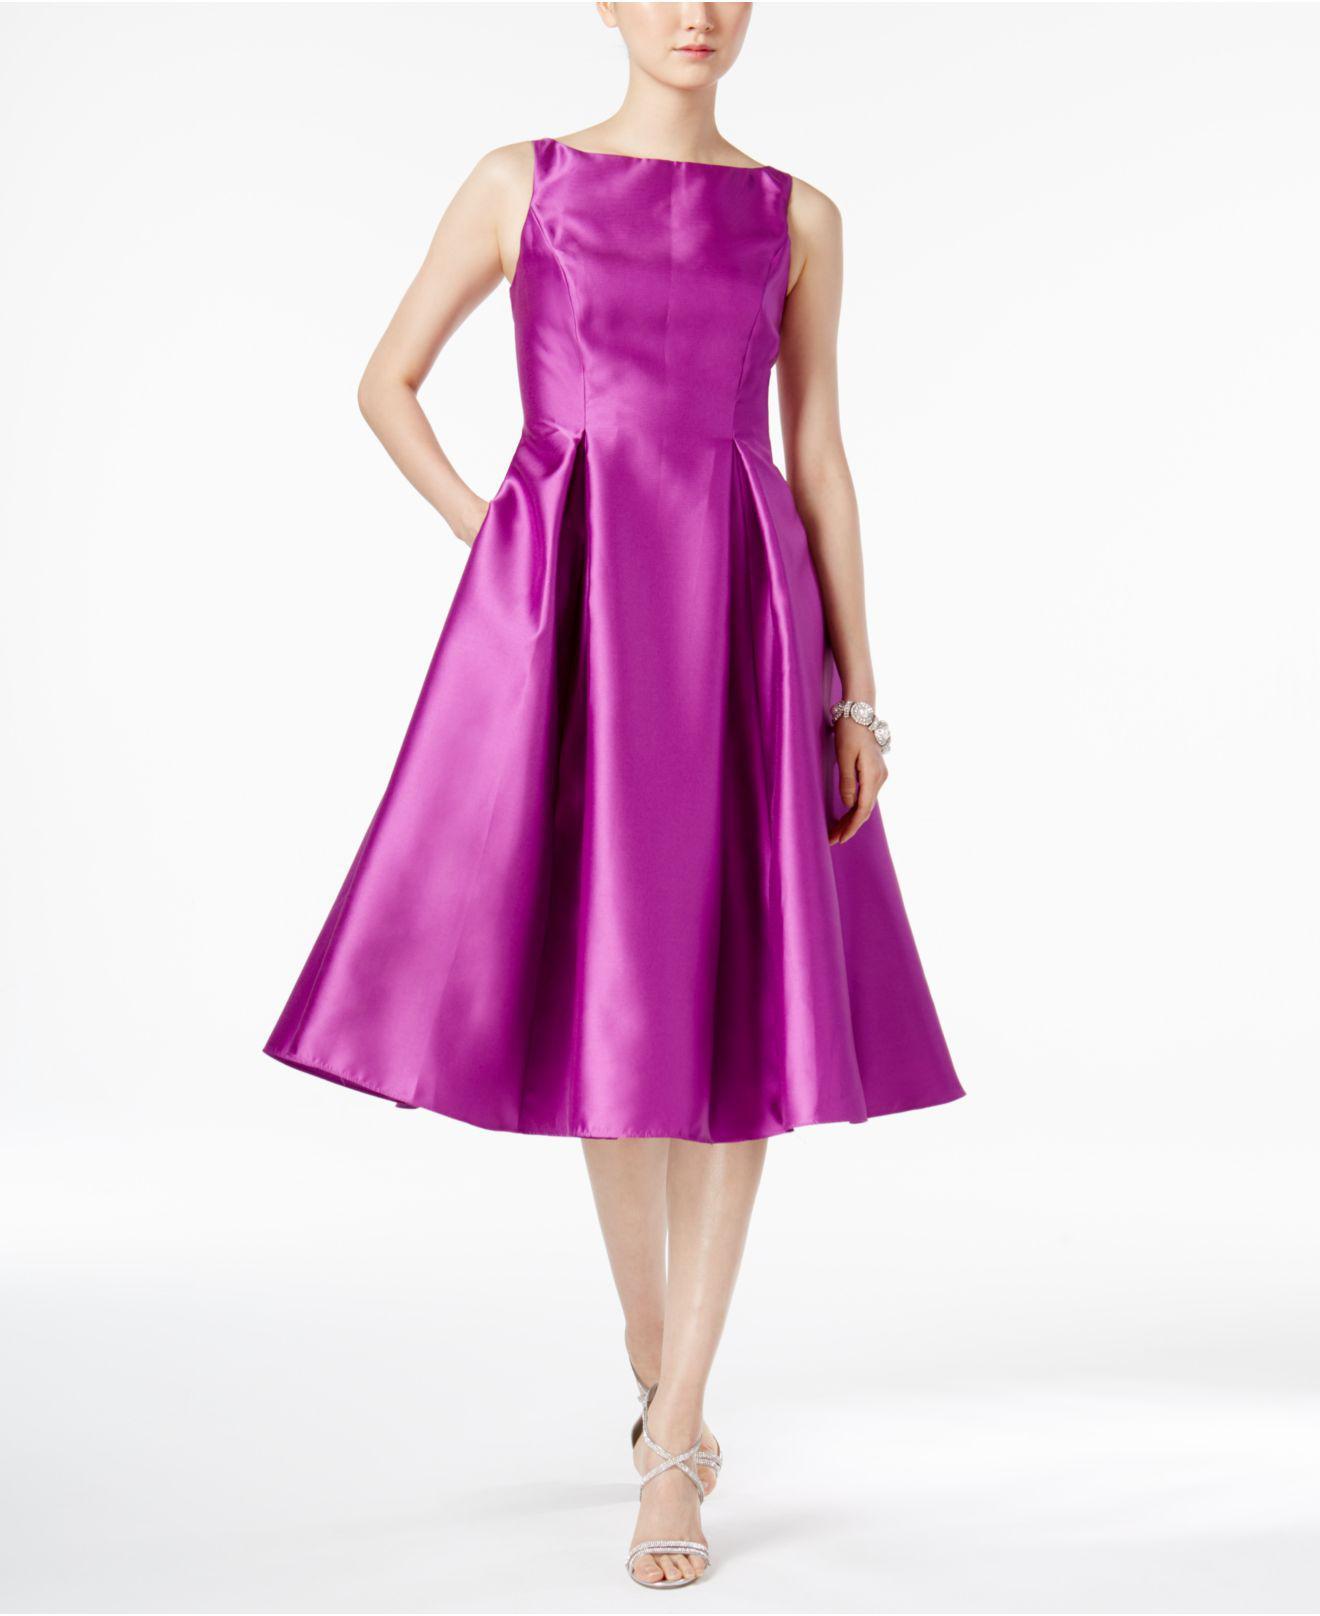 Asombroso Vestidos De Fiesta Dillards Motivo - Ideas de Vestidos de ...